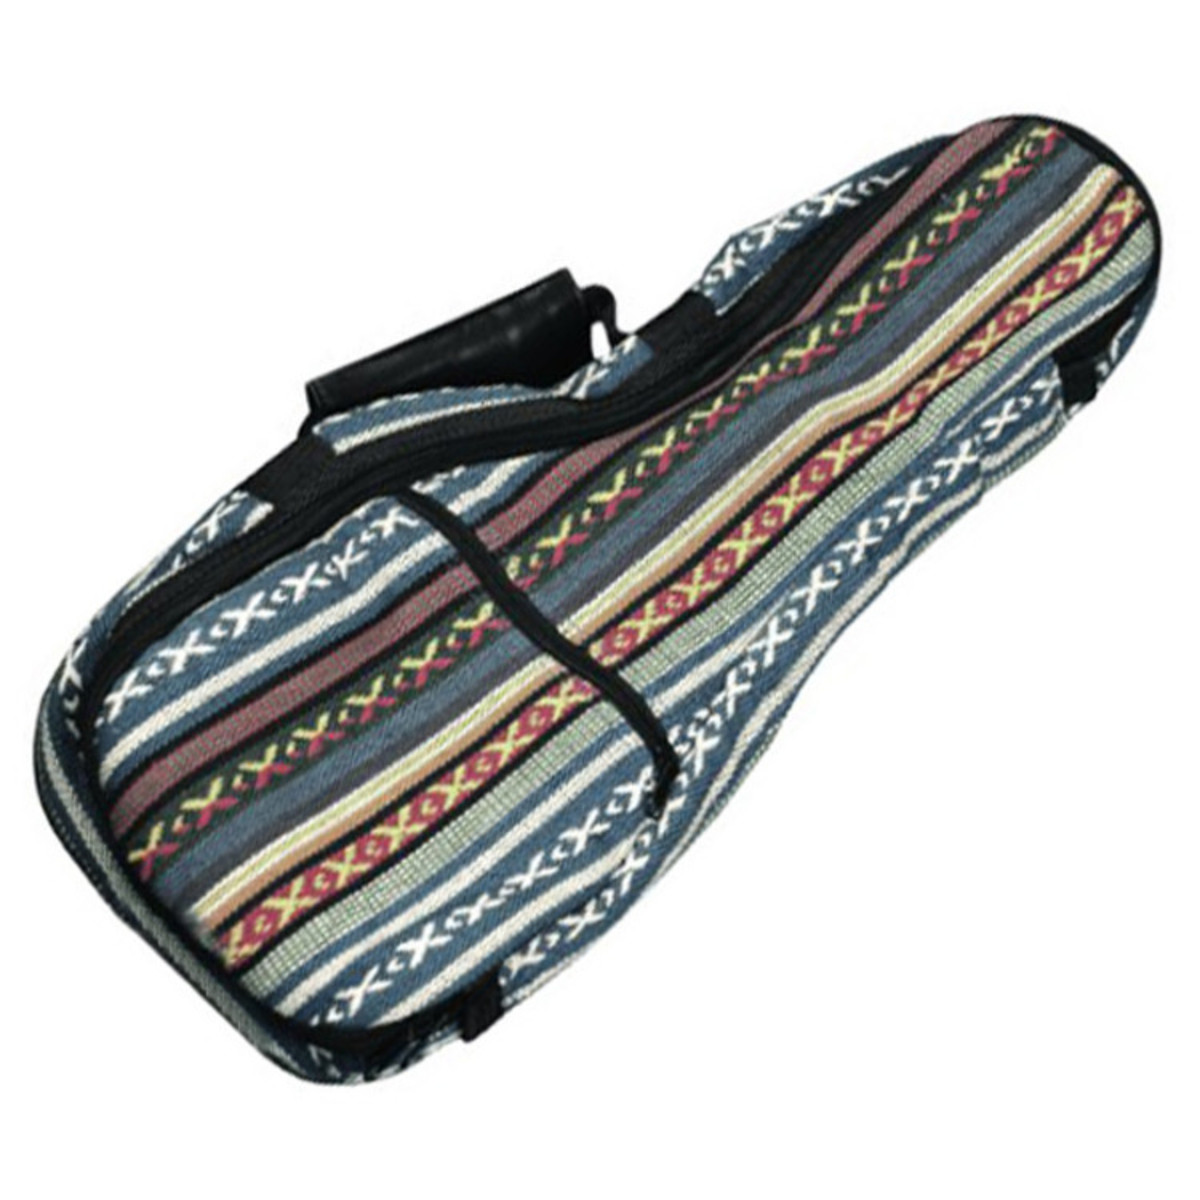 Image of Eddy Finn Hippie Uke Bag Tenor